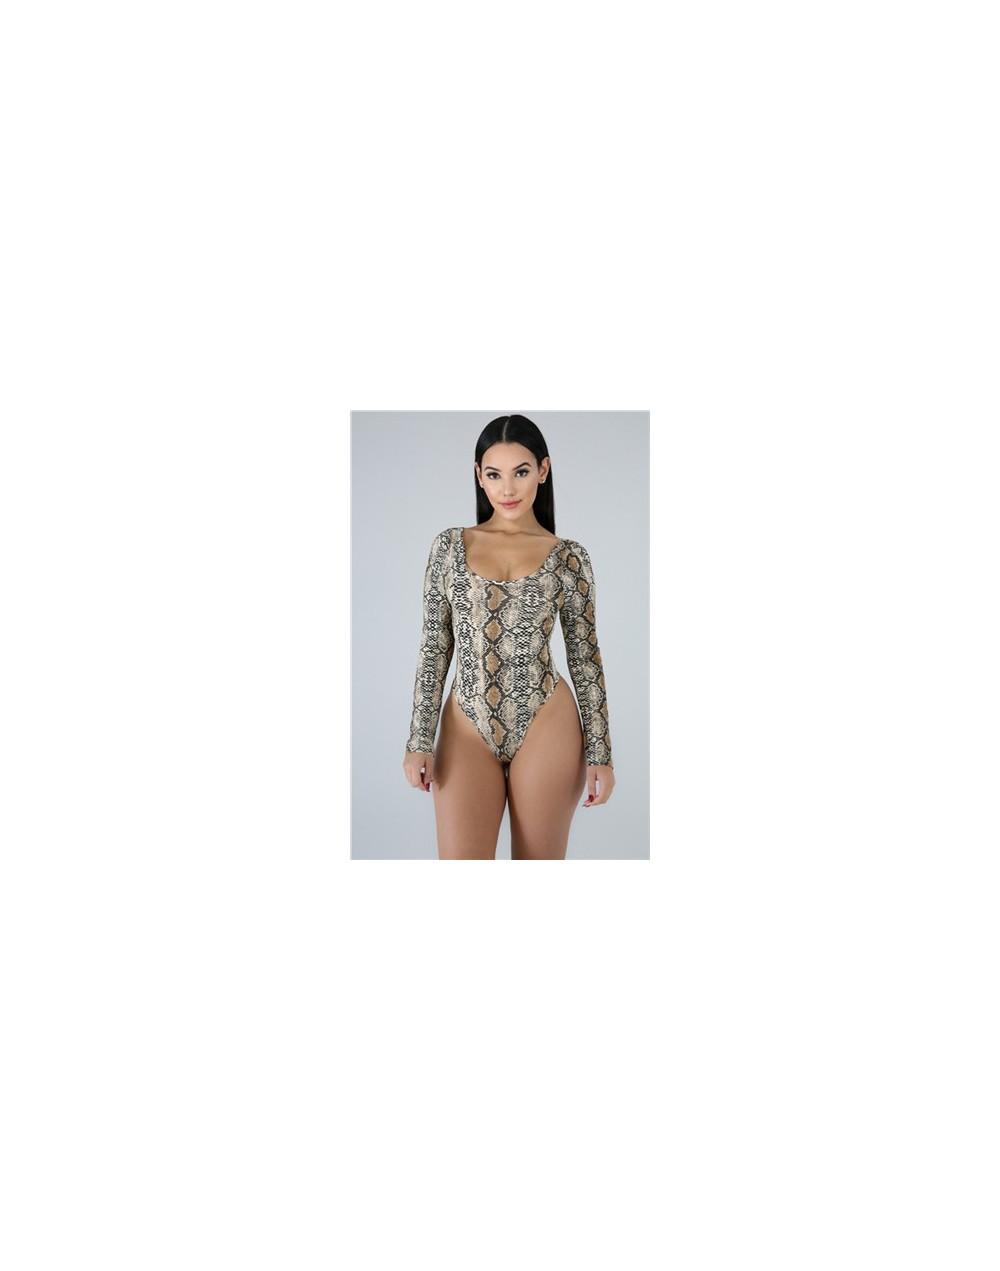 Women Sexy Snakeskin Print Bodysuits Scoop Neck Long Sleeve Casual Romper Fashion Tops Summer Swimwear Swimming Suit - brown...